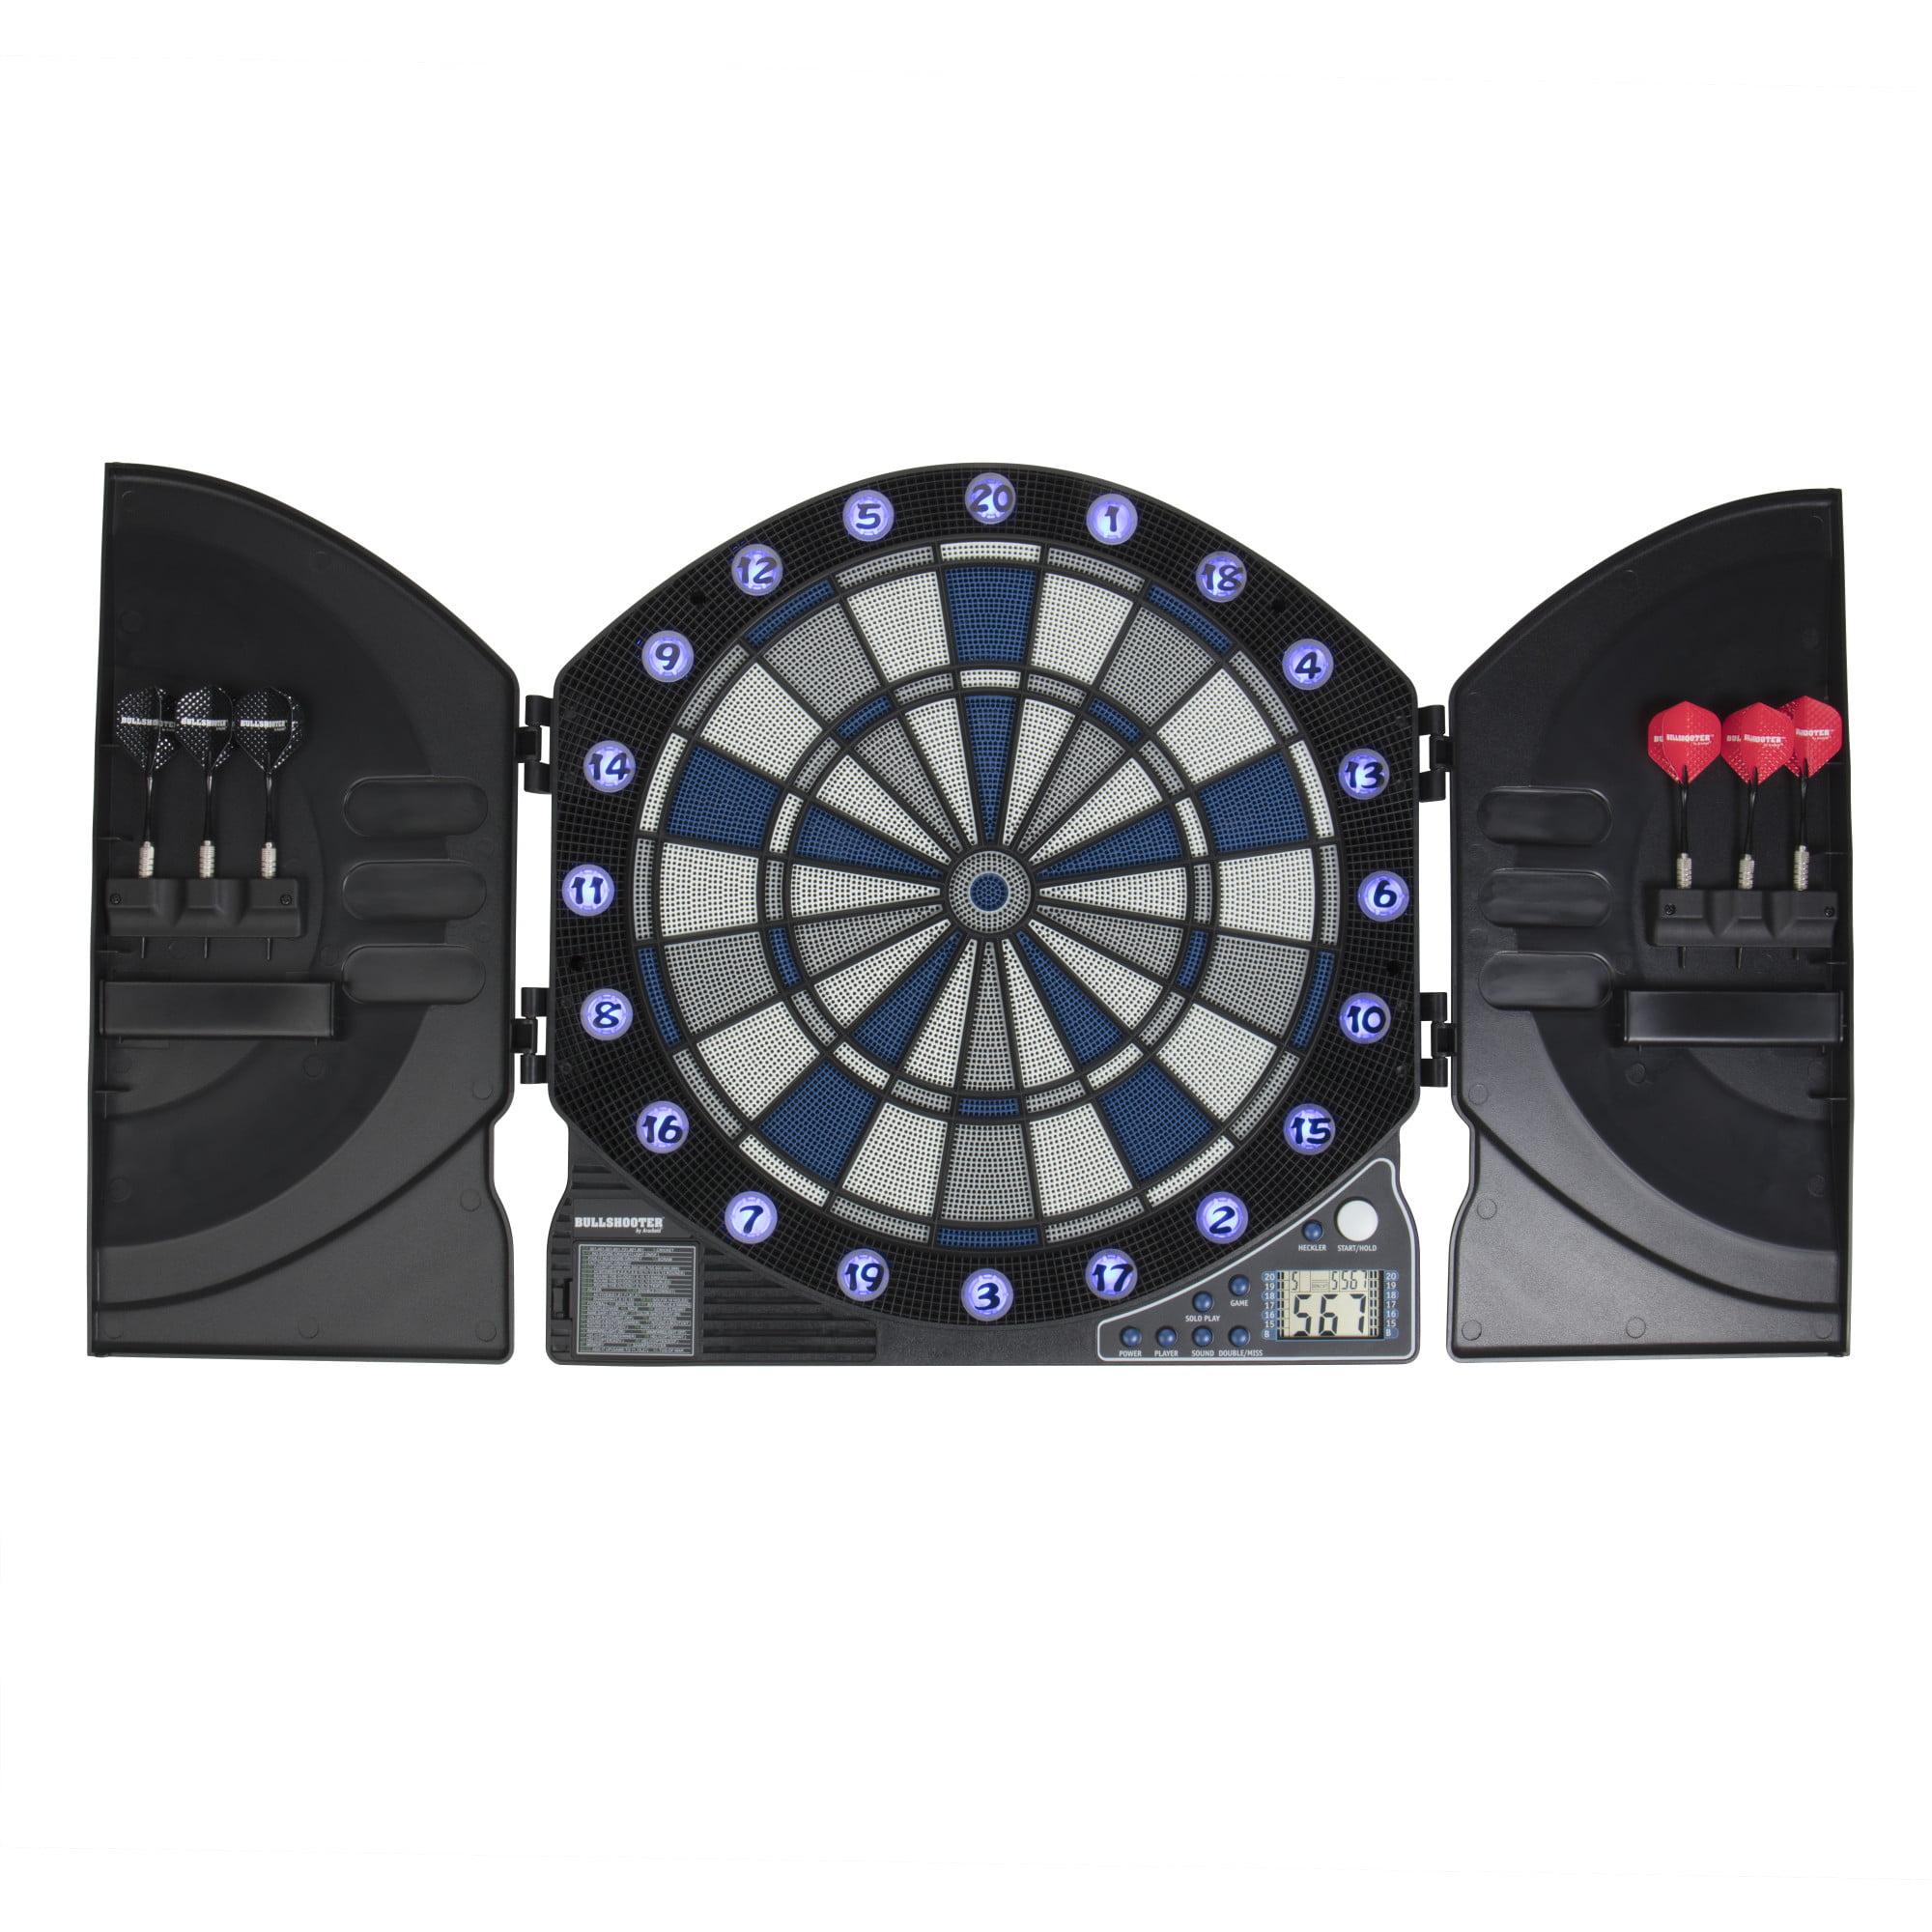 Bullshooter by Arachnid Illuminator 3.0 Electronic Dartboard and Cabinet with 13 LED Light Up Games